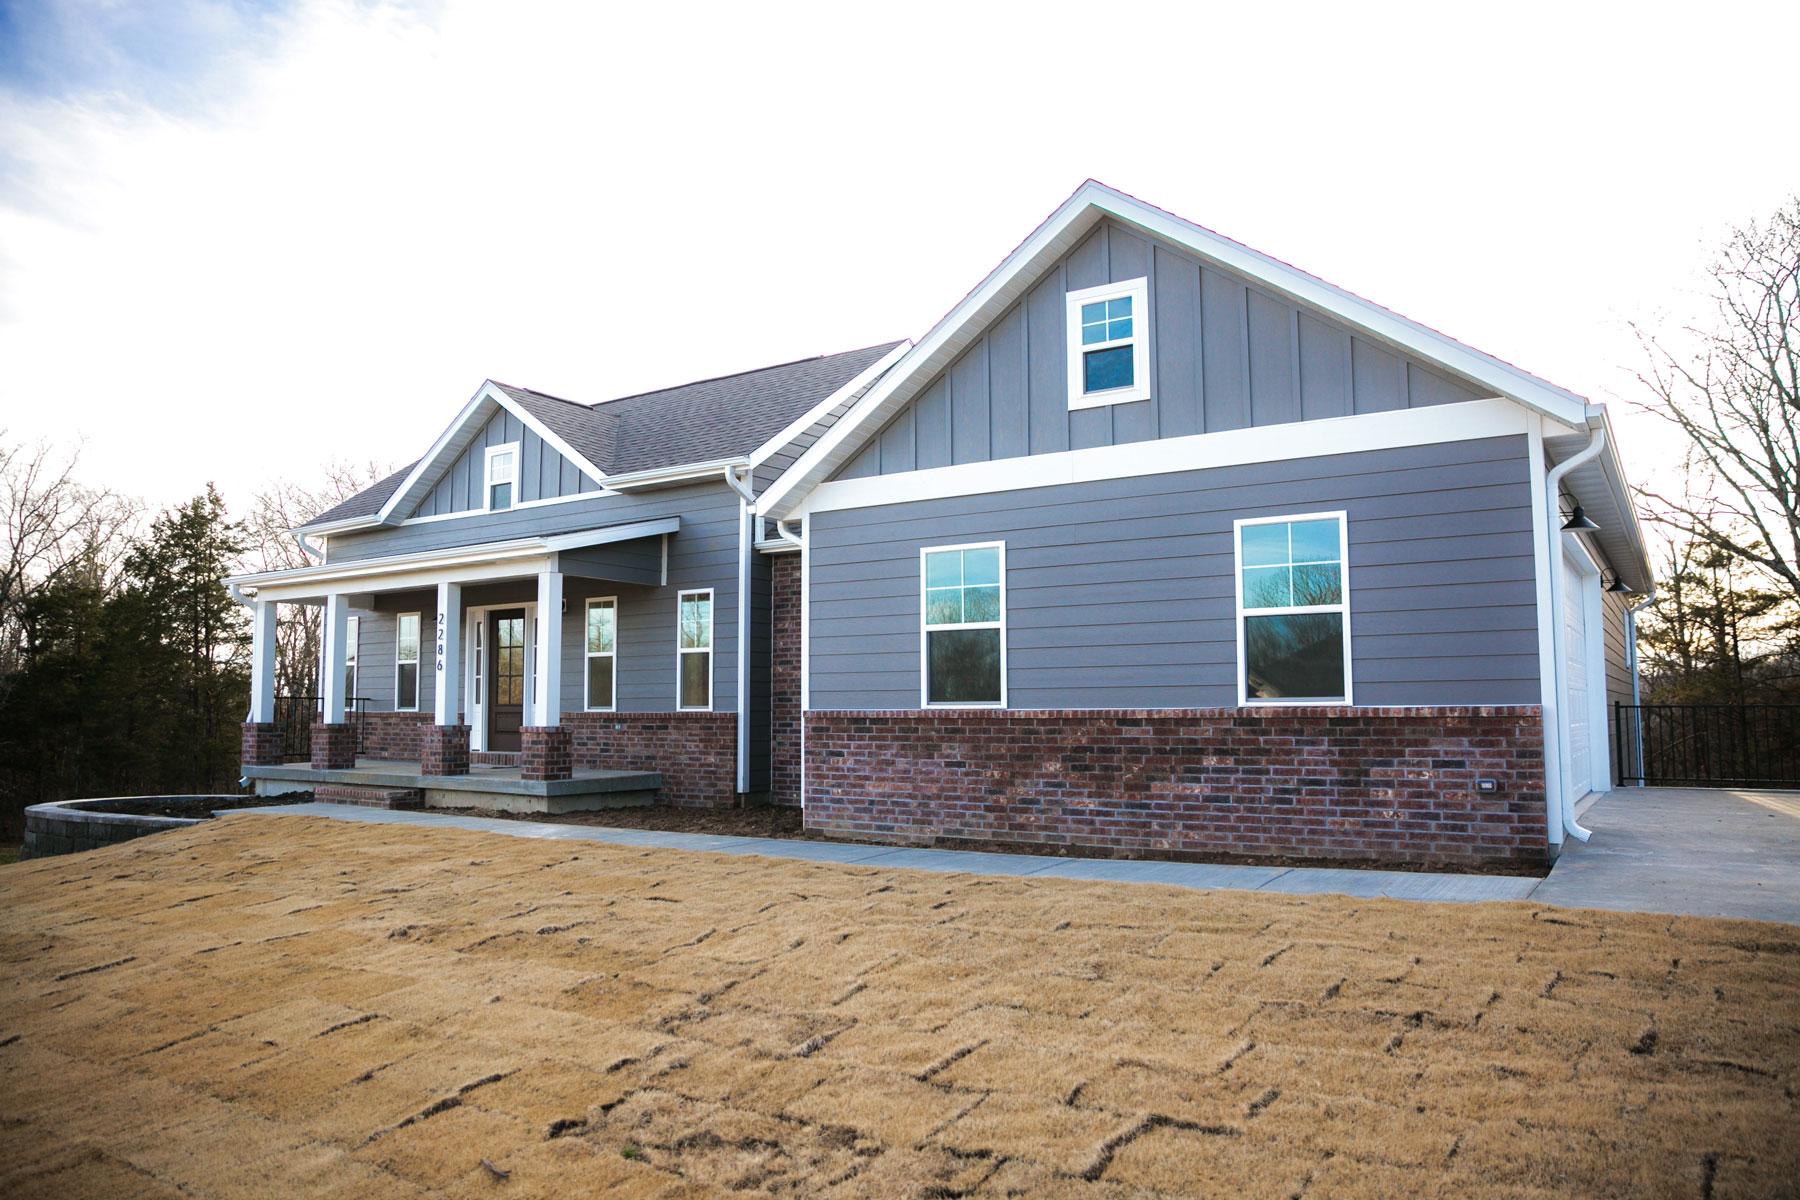 Emory Creek Custom Home Smj Builders